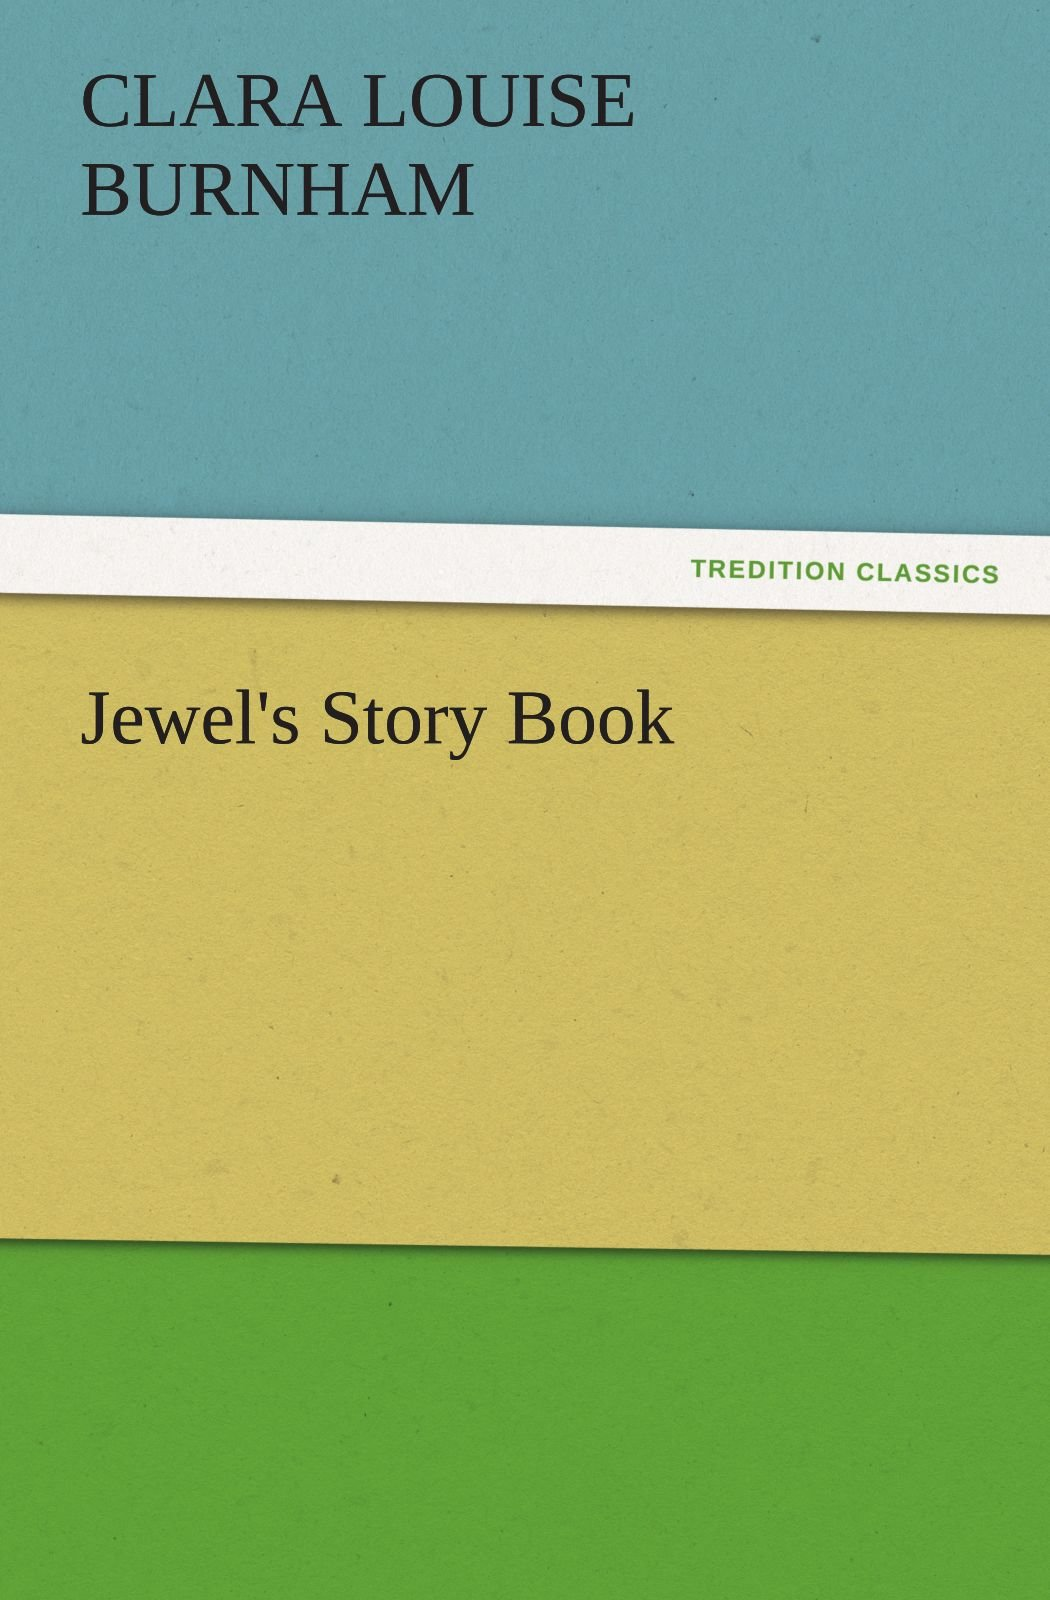 Download Jewel's Story Book (TREDITION CLASSICS) ebook